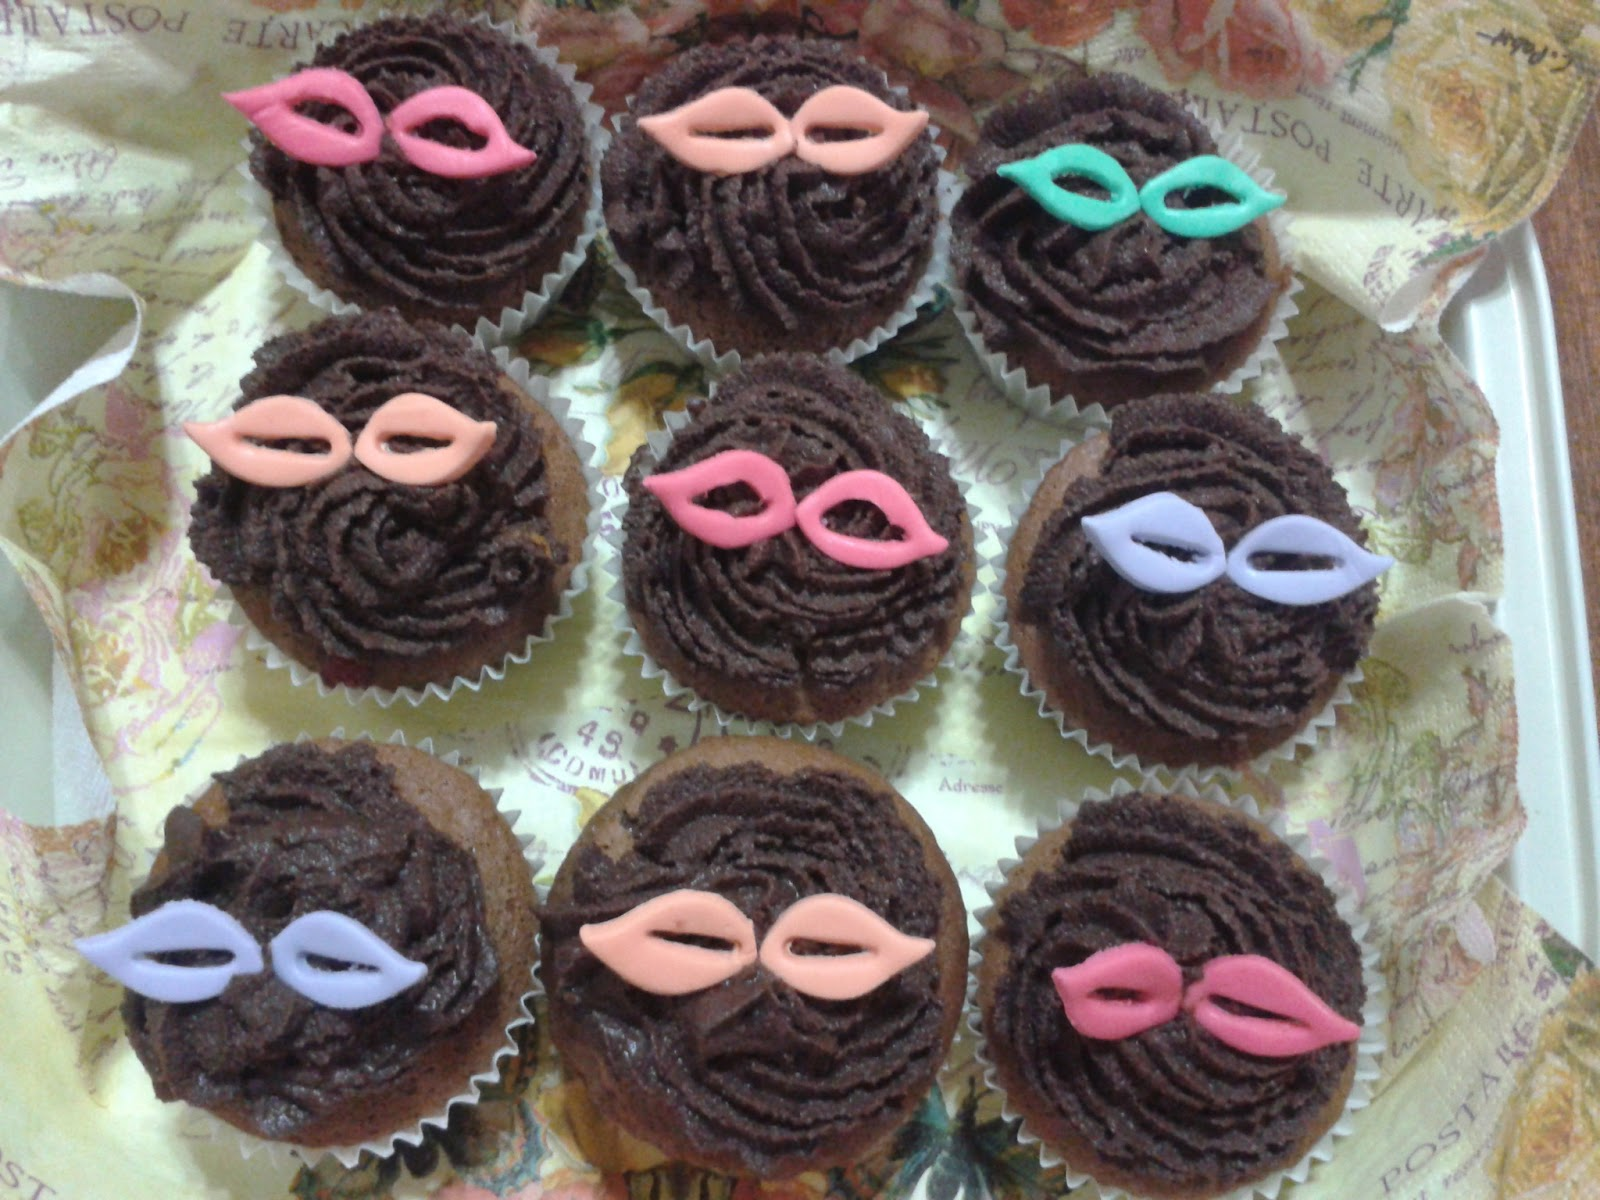 Cupcakes tenerife cupcakes de carnavales - Cupcakes tenerife ...